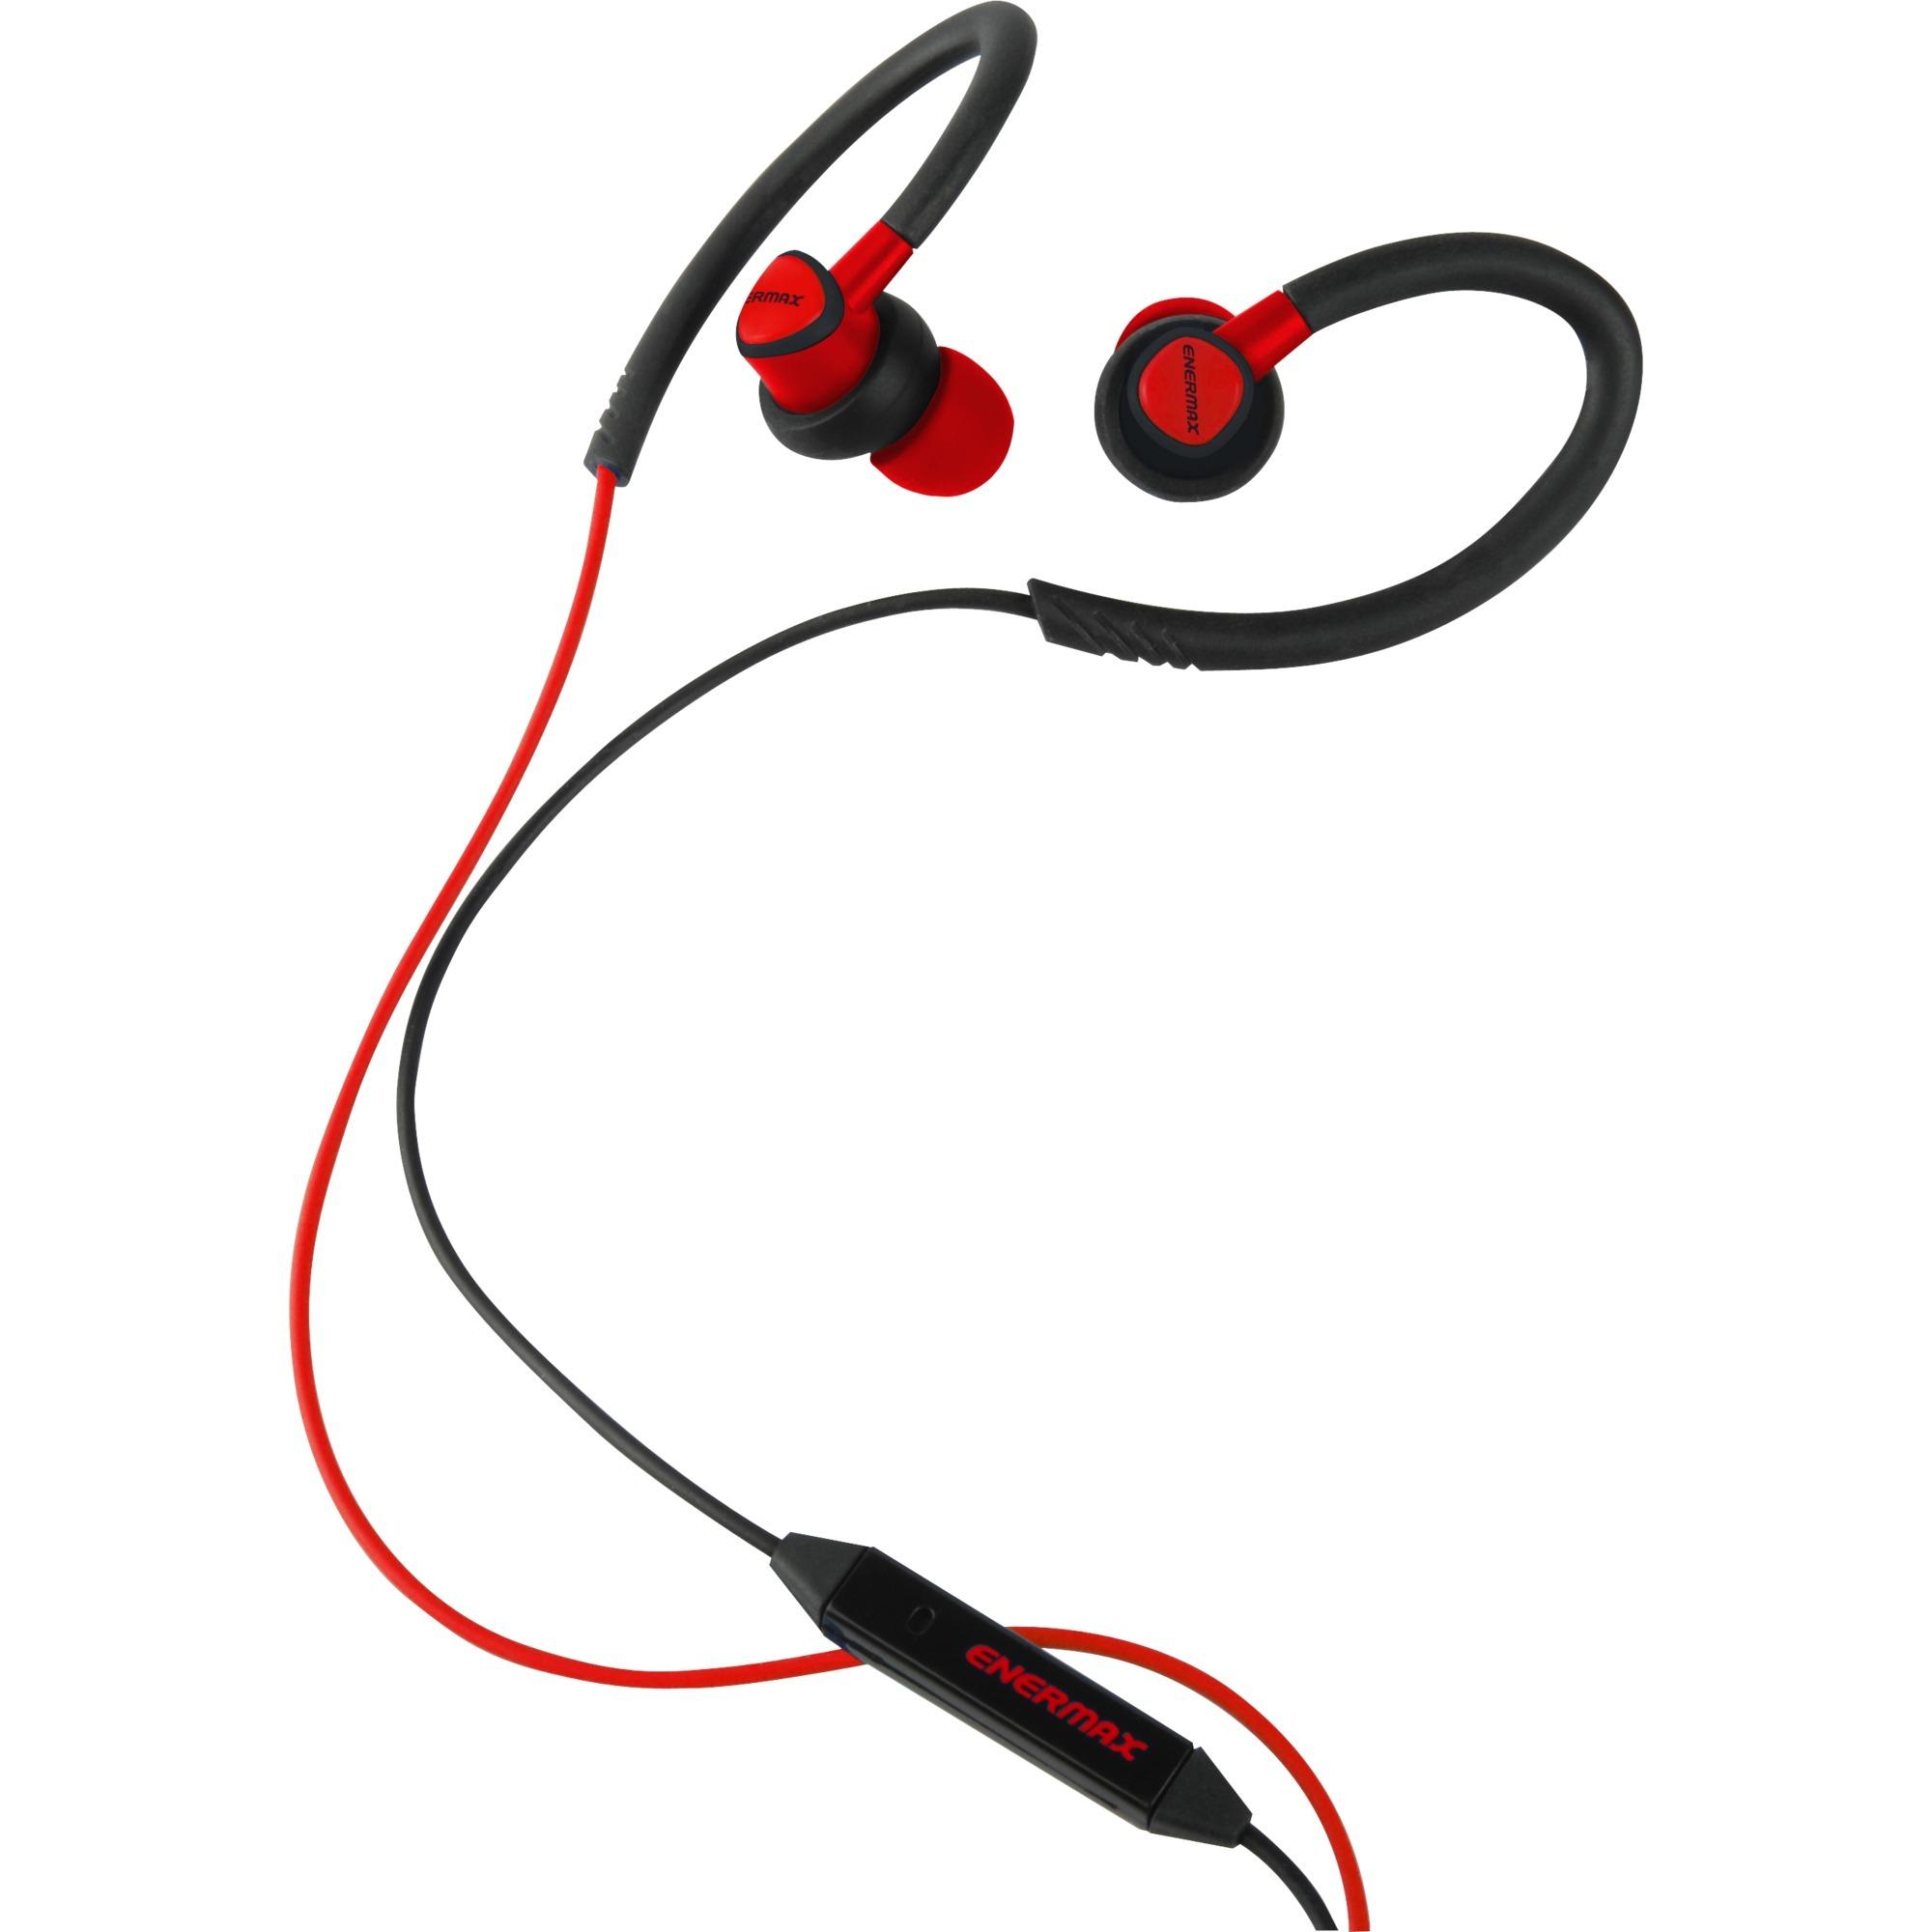 EAE01-R gancho de oreja, Dentro de oído Binaurale Alámbrico Negro, Rojo auriculares para móvil, Auriculares con micrófono